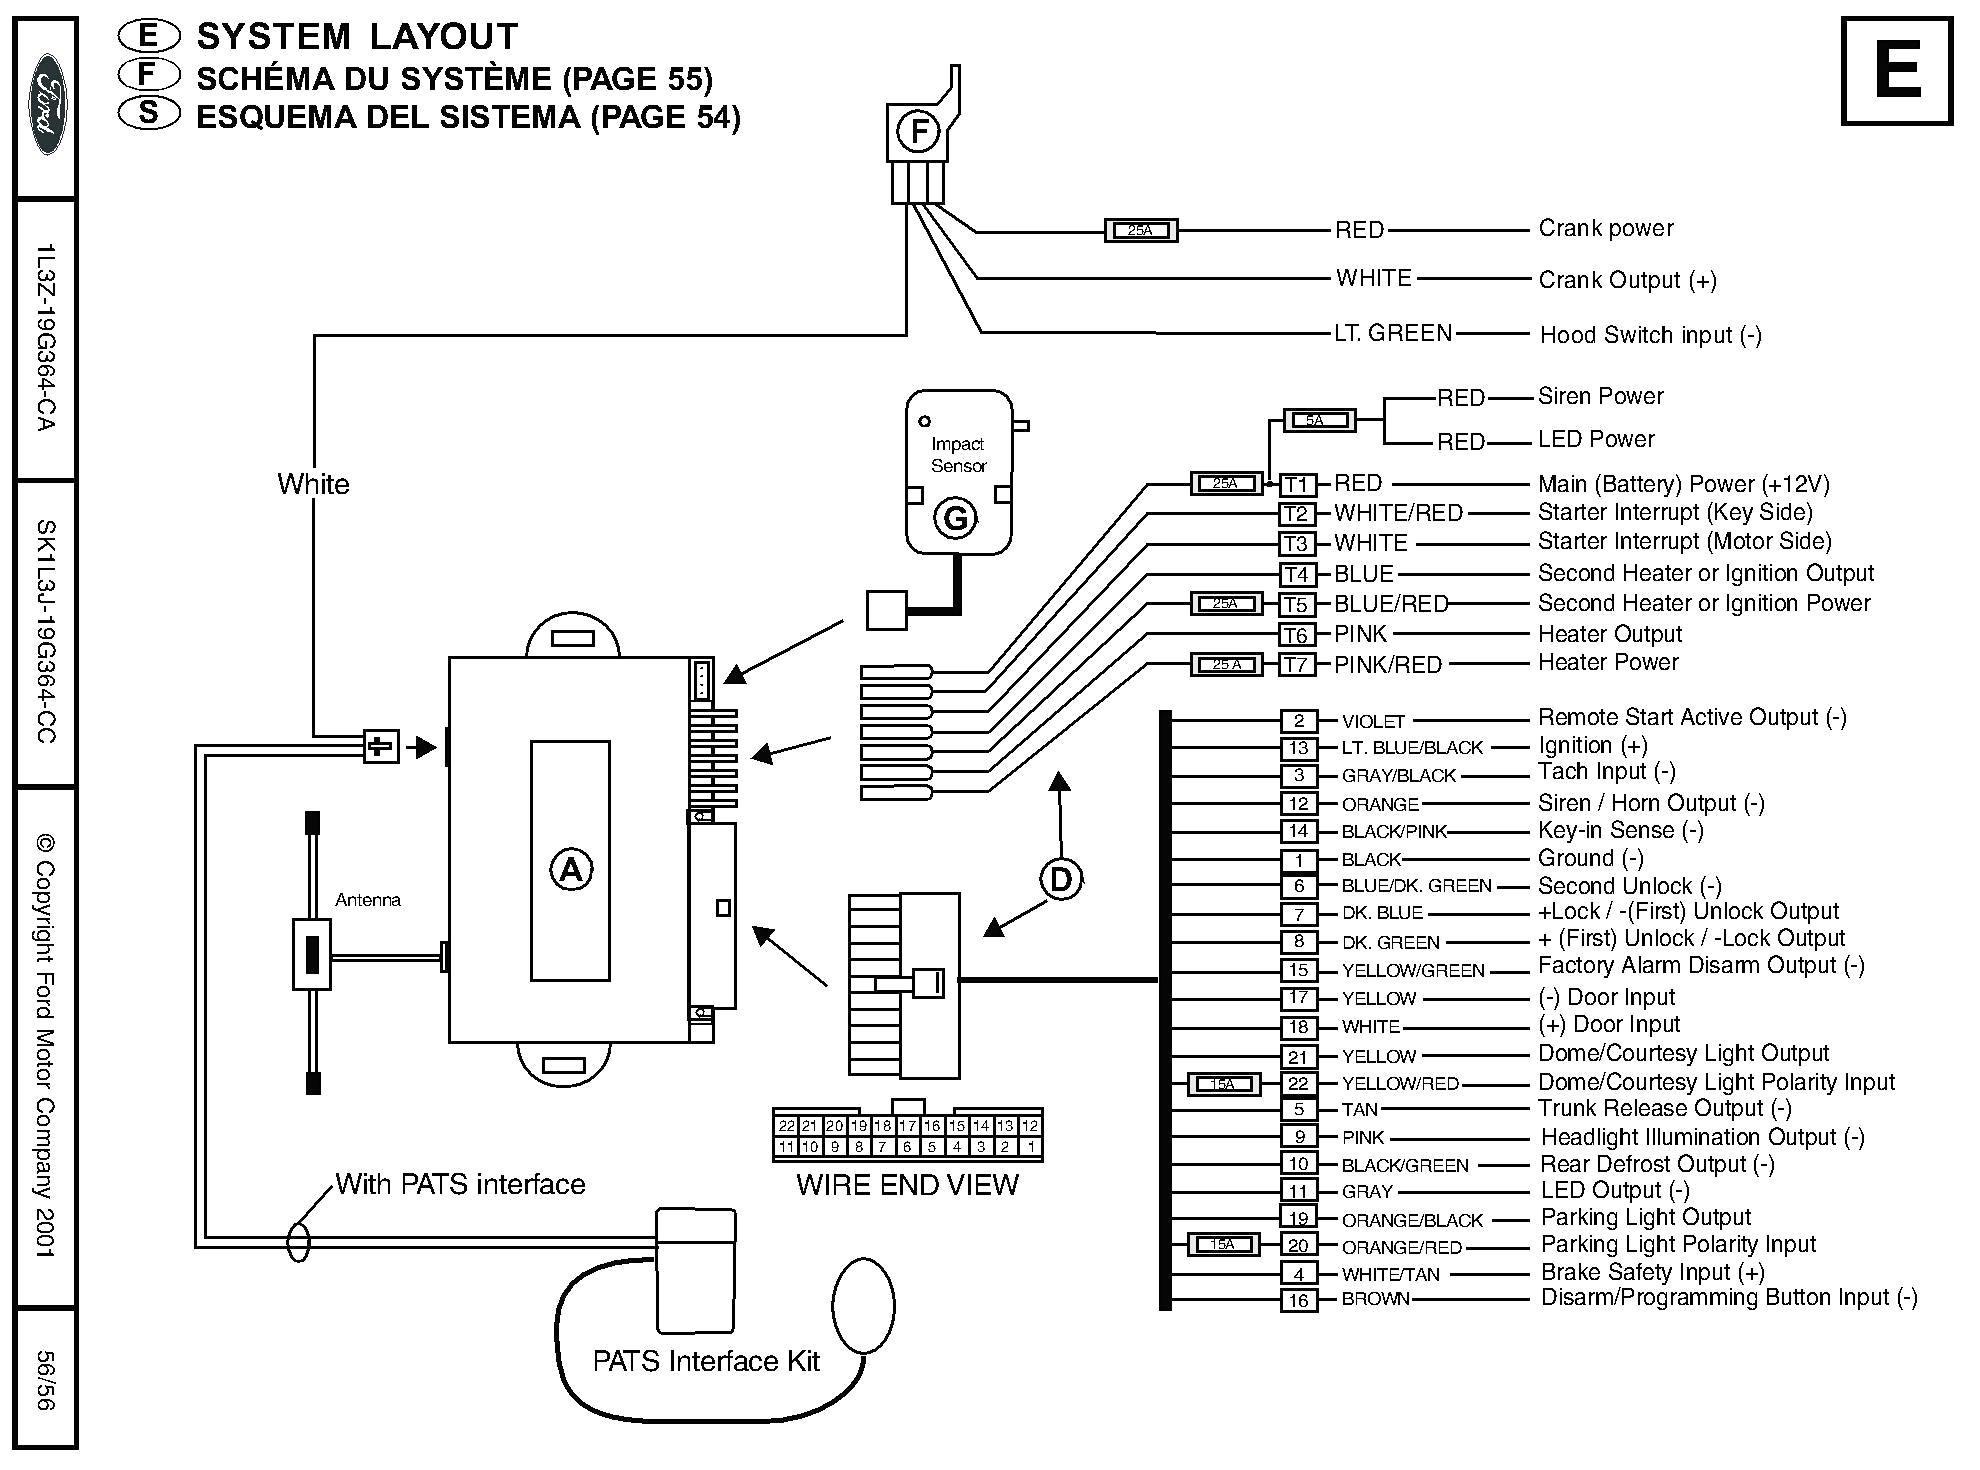 Diagram for Car Mobilizer Auto Starter Wiring Diagram Autoctono Of Diagram for Car Mobilizer